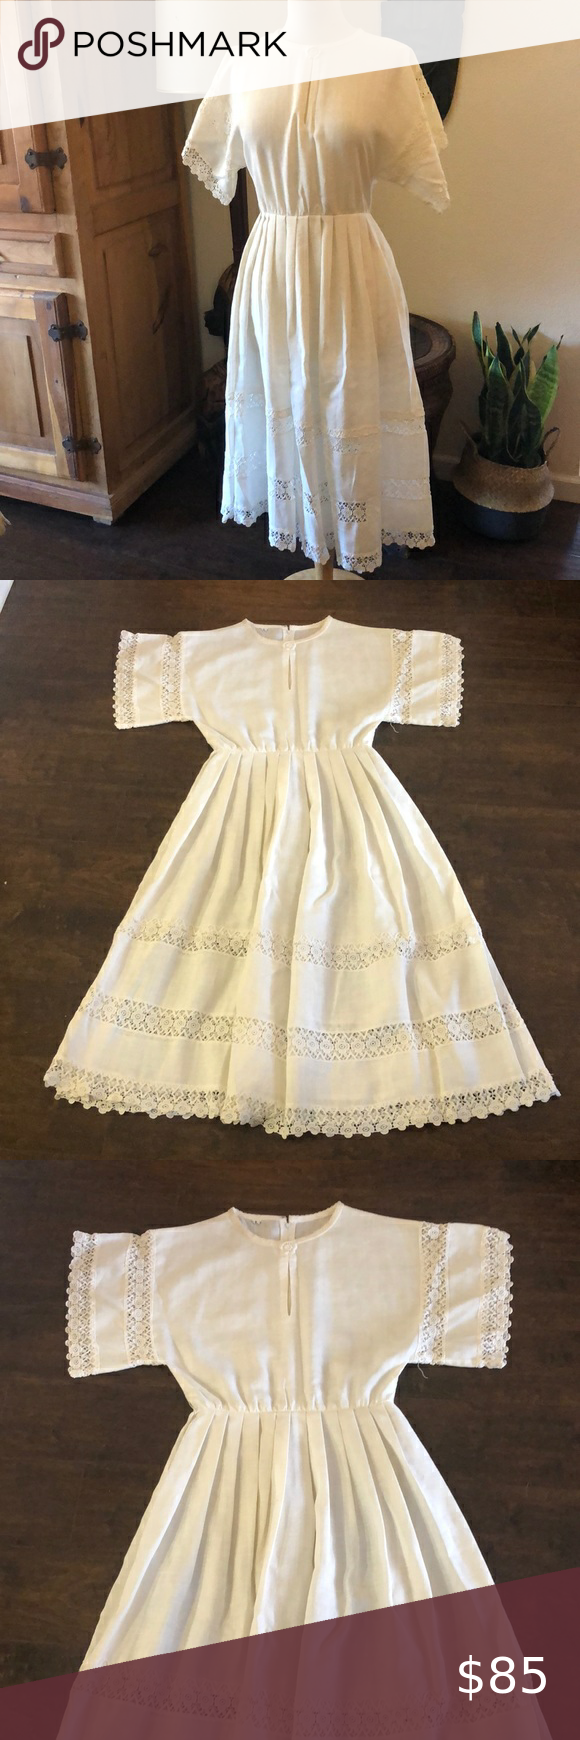 Vintage 70s Summer Dress Summer Dresses Cotton Dress Summer Dresses [ 1740 x 580 Pixel ]